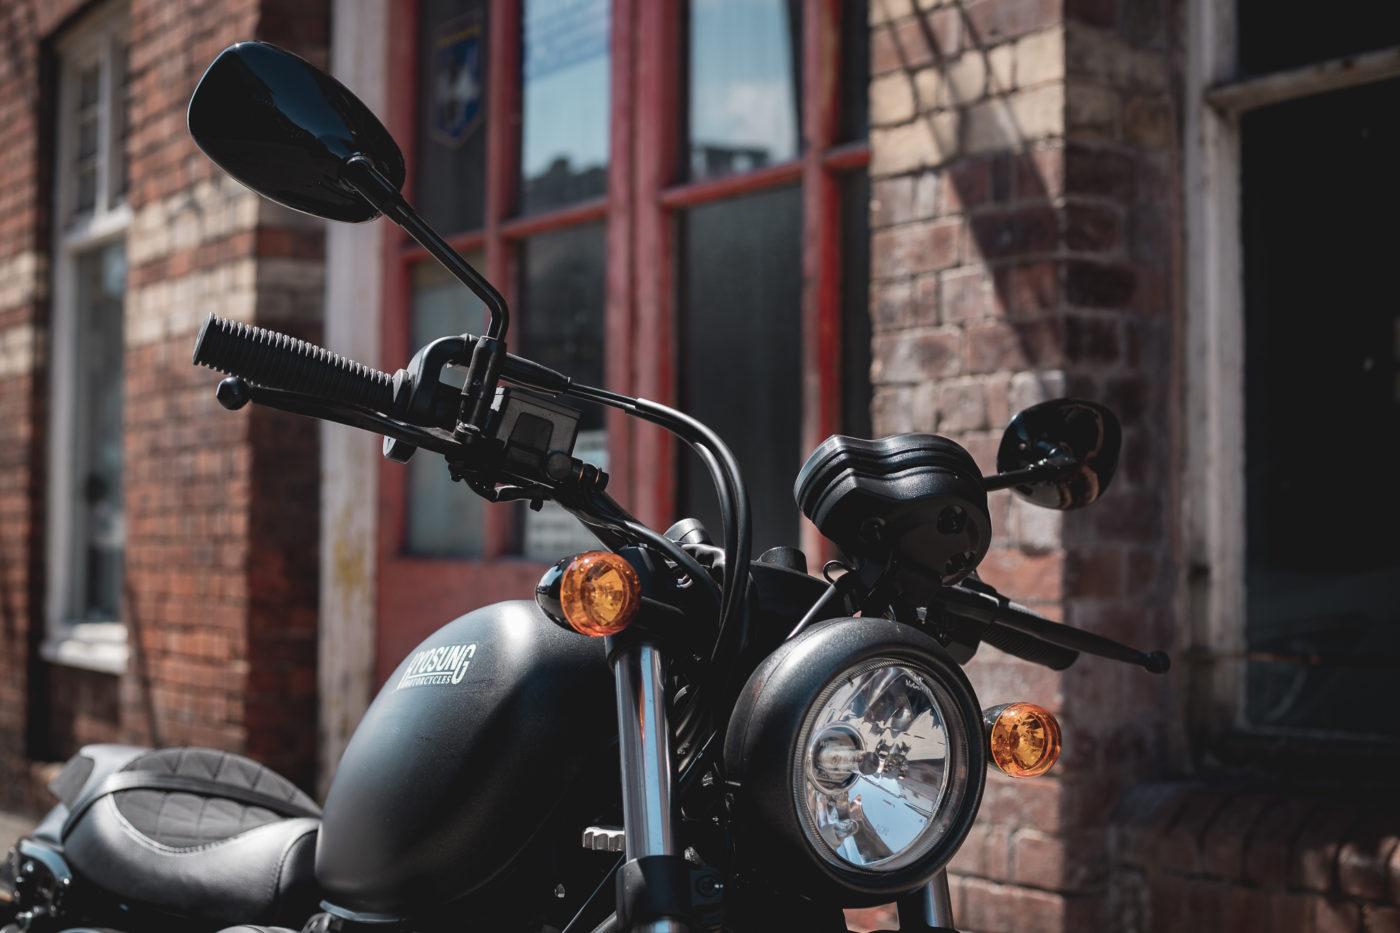 Classic round motorcycle headlight